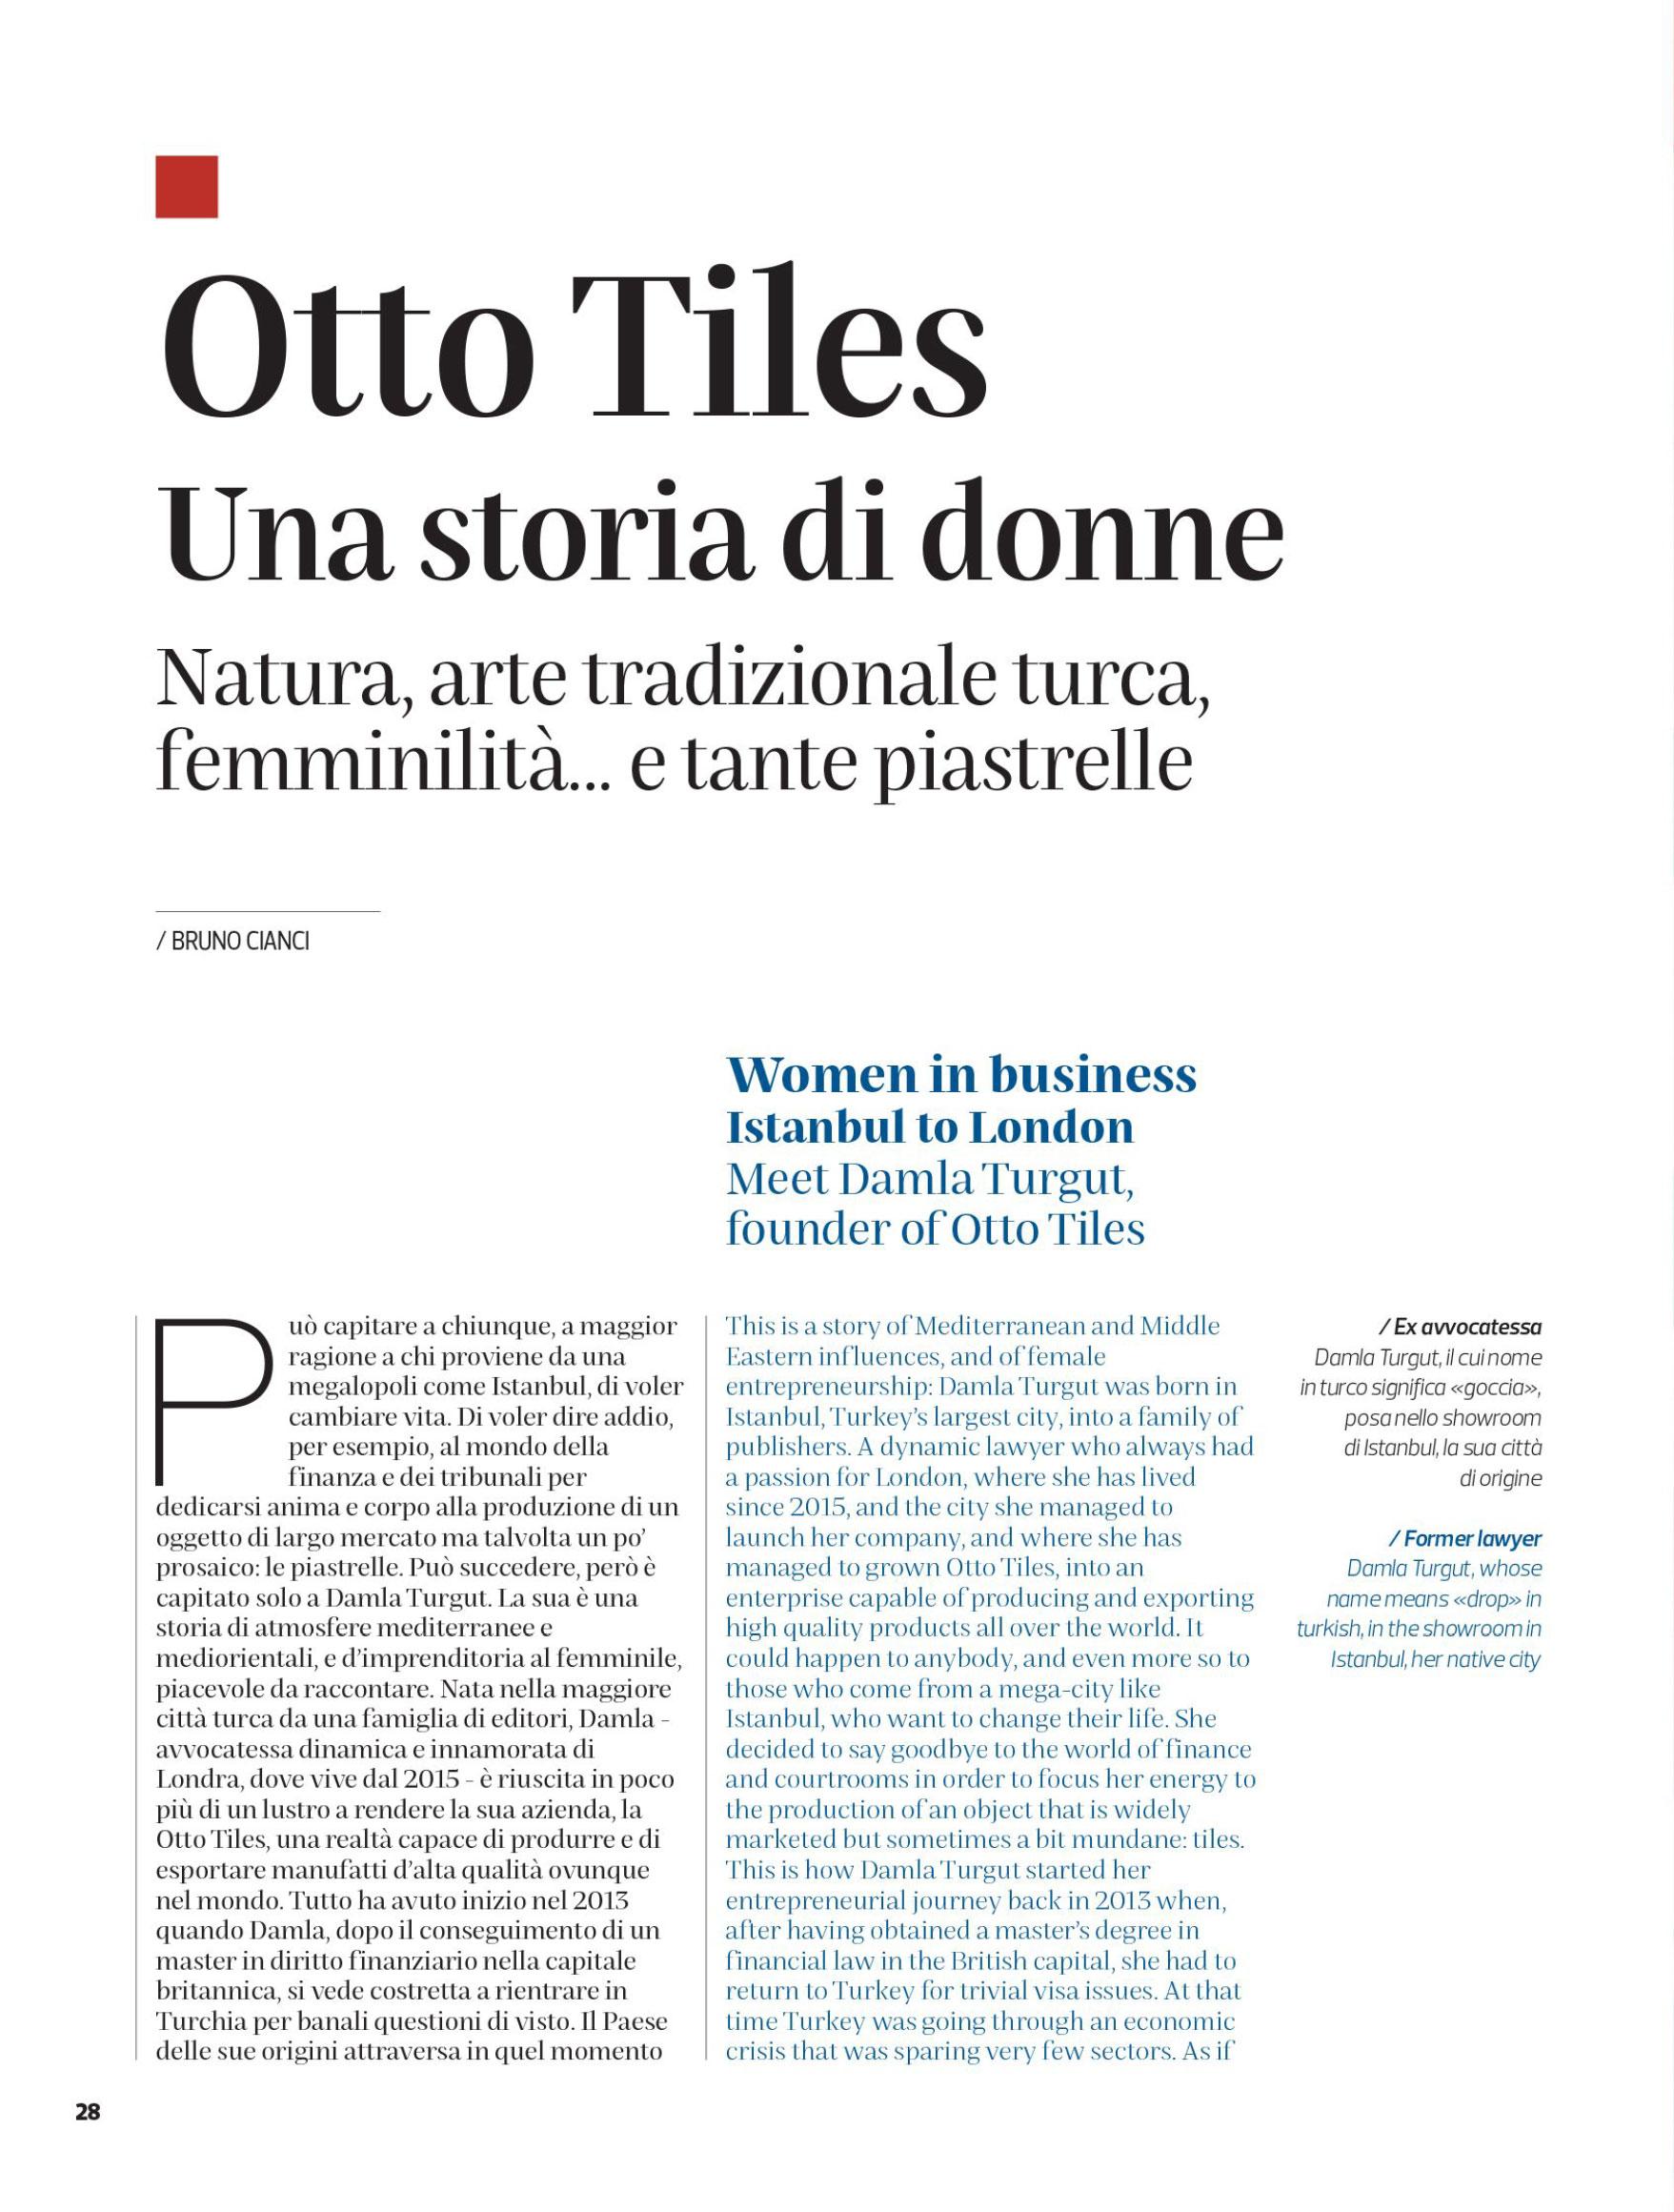 Corriere del Ticino – May 2021